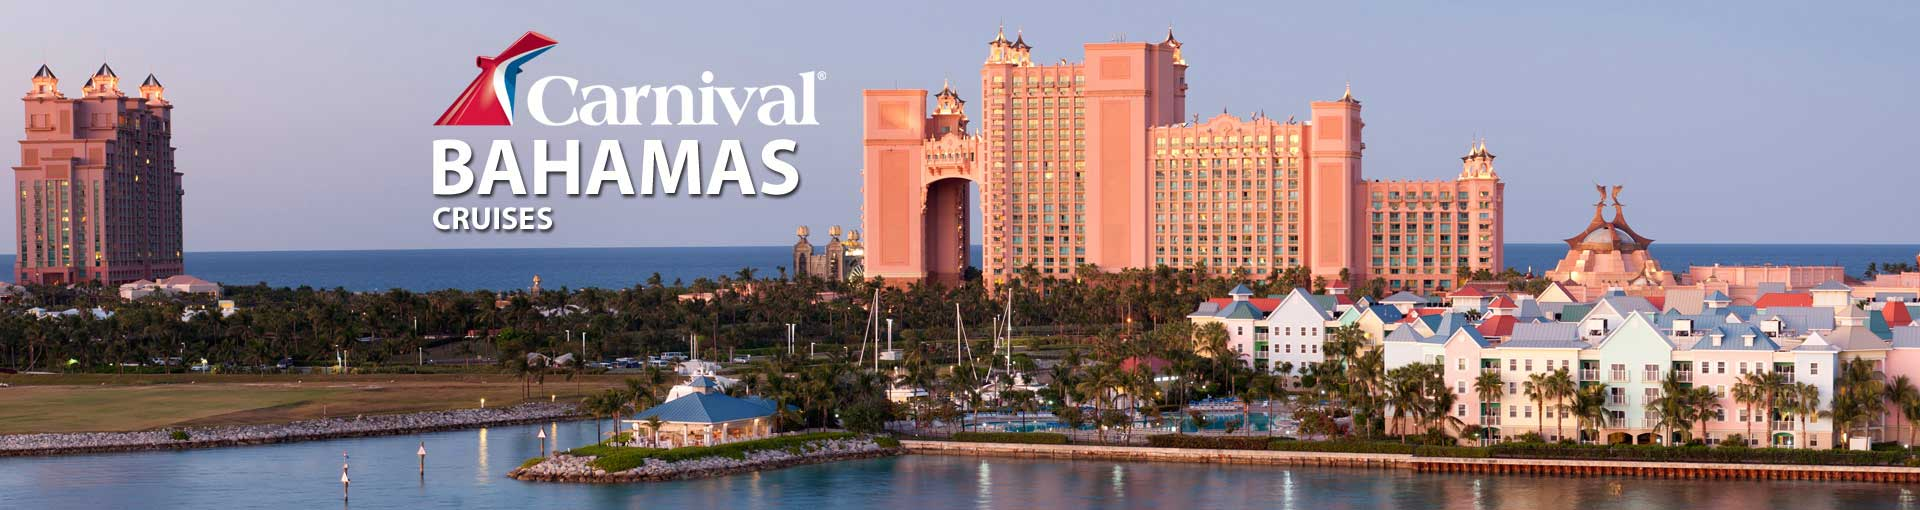 Carnival Cruise Lines Bahamas Cruises